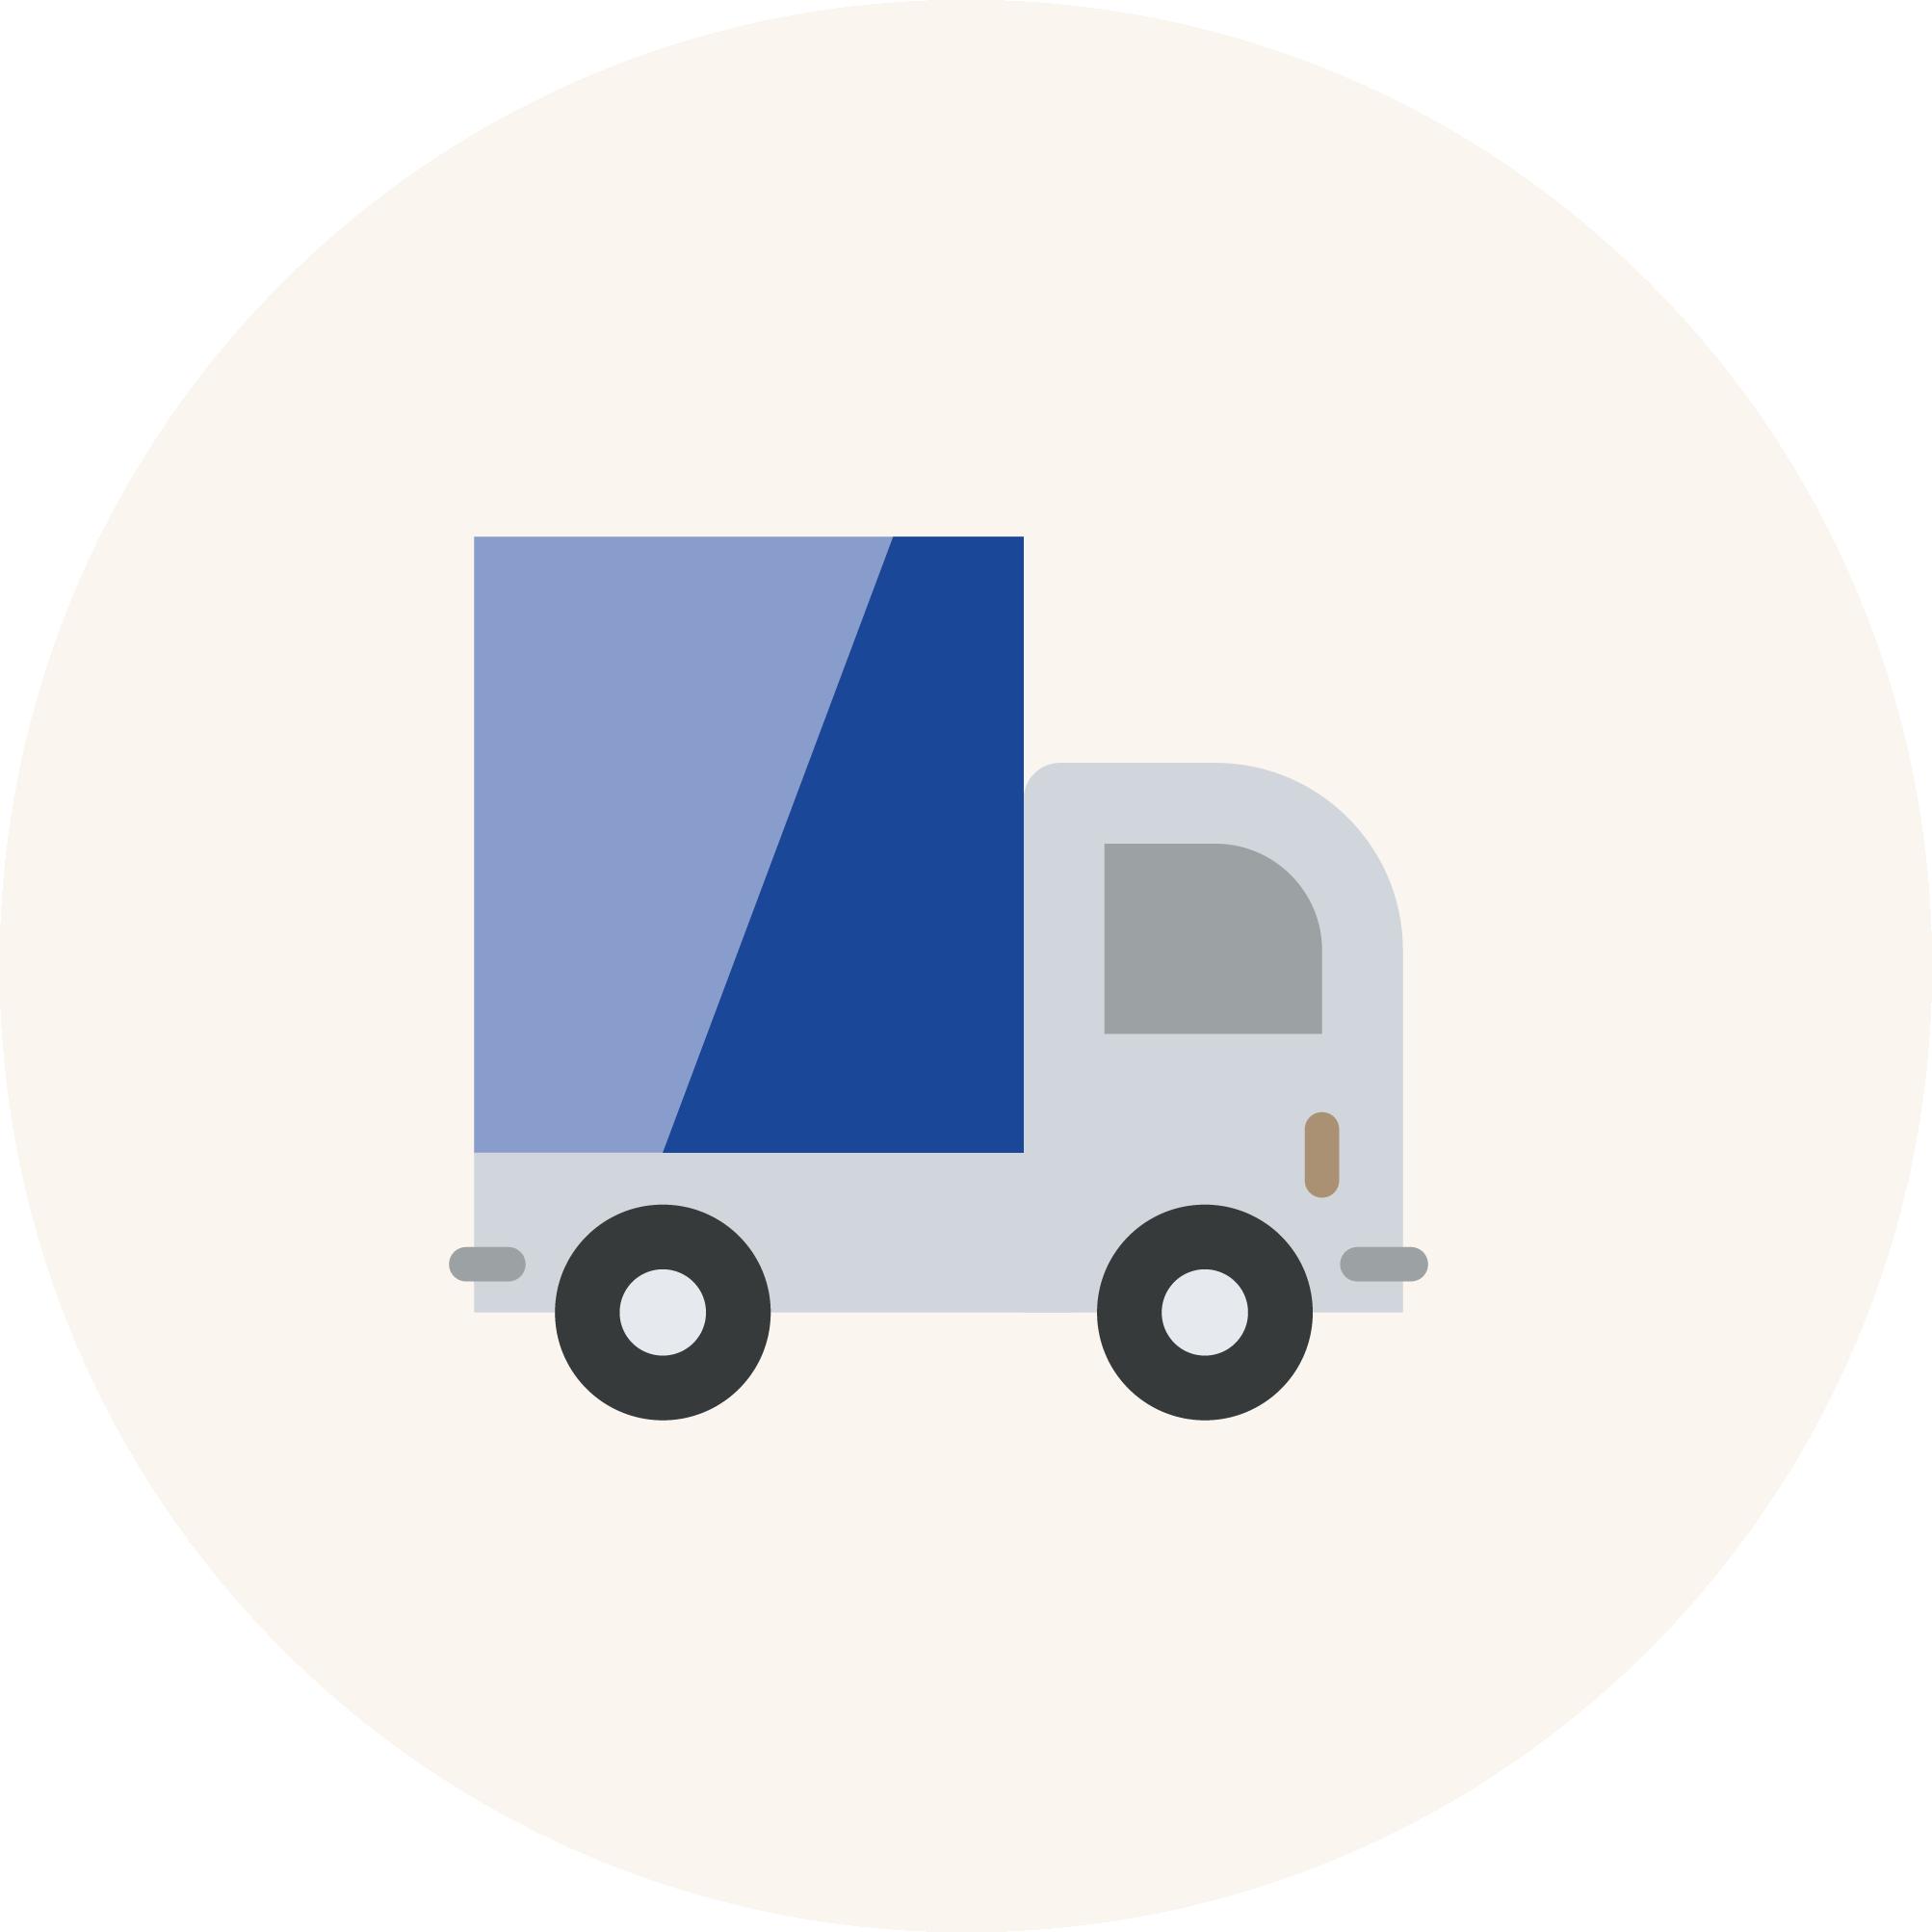 PorterRun_DeliveryIcon@4x.png